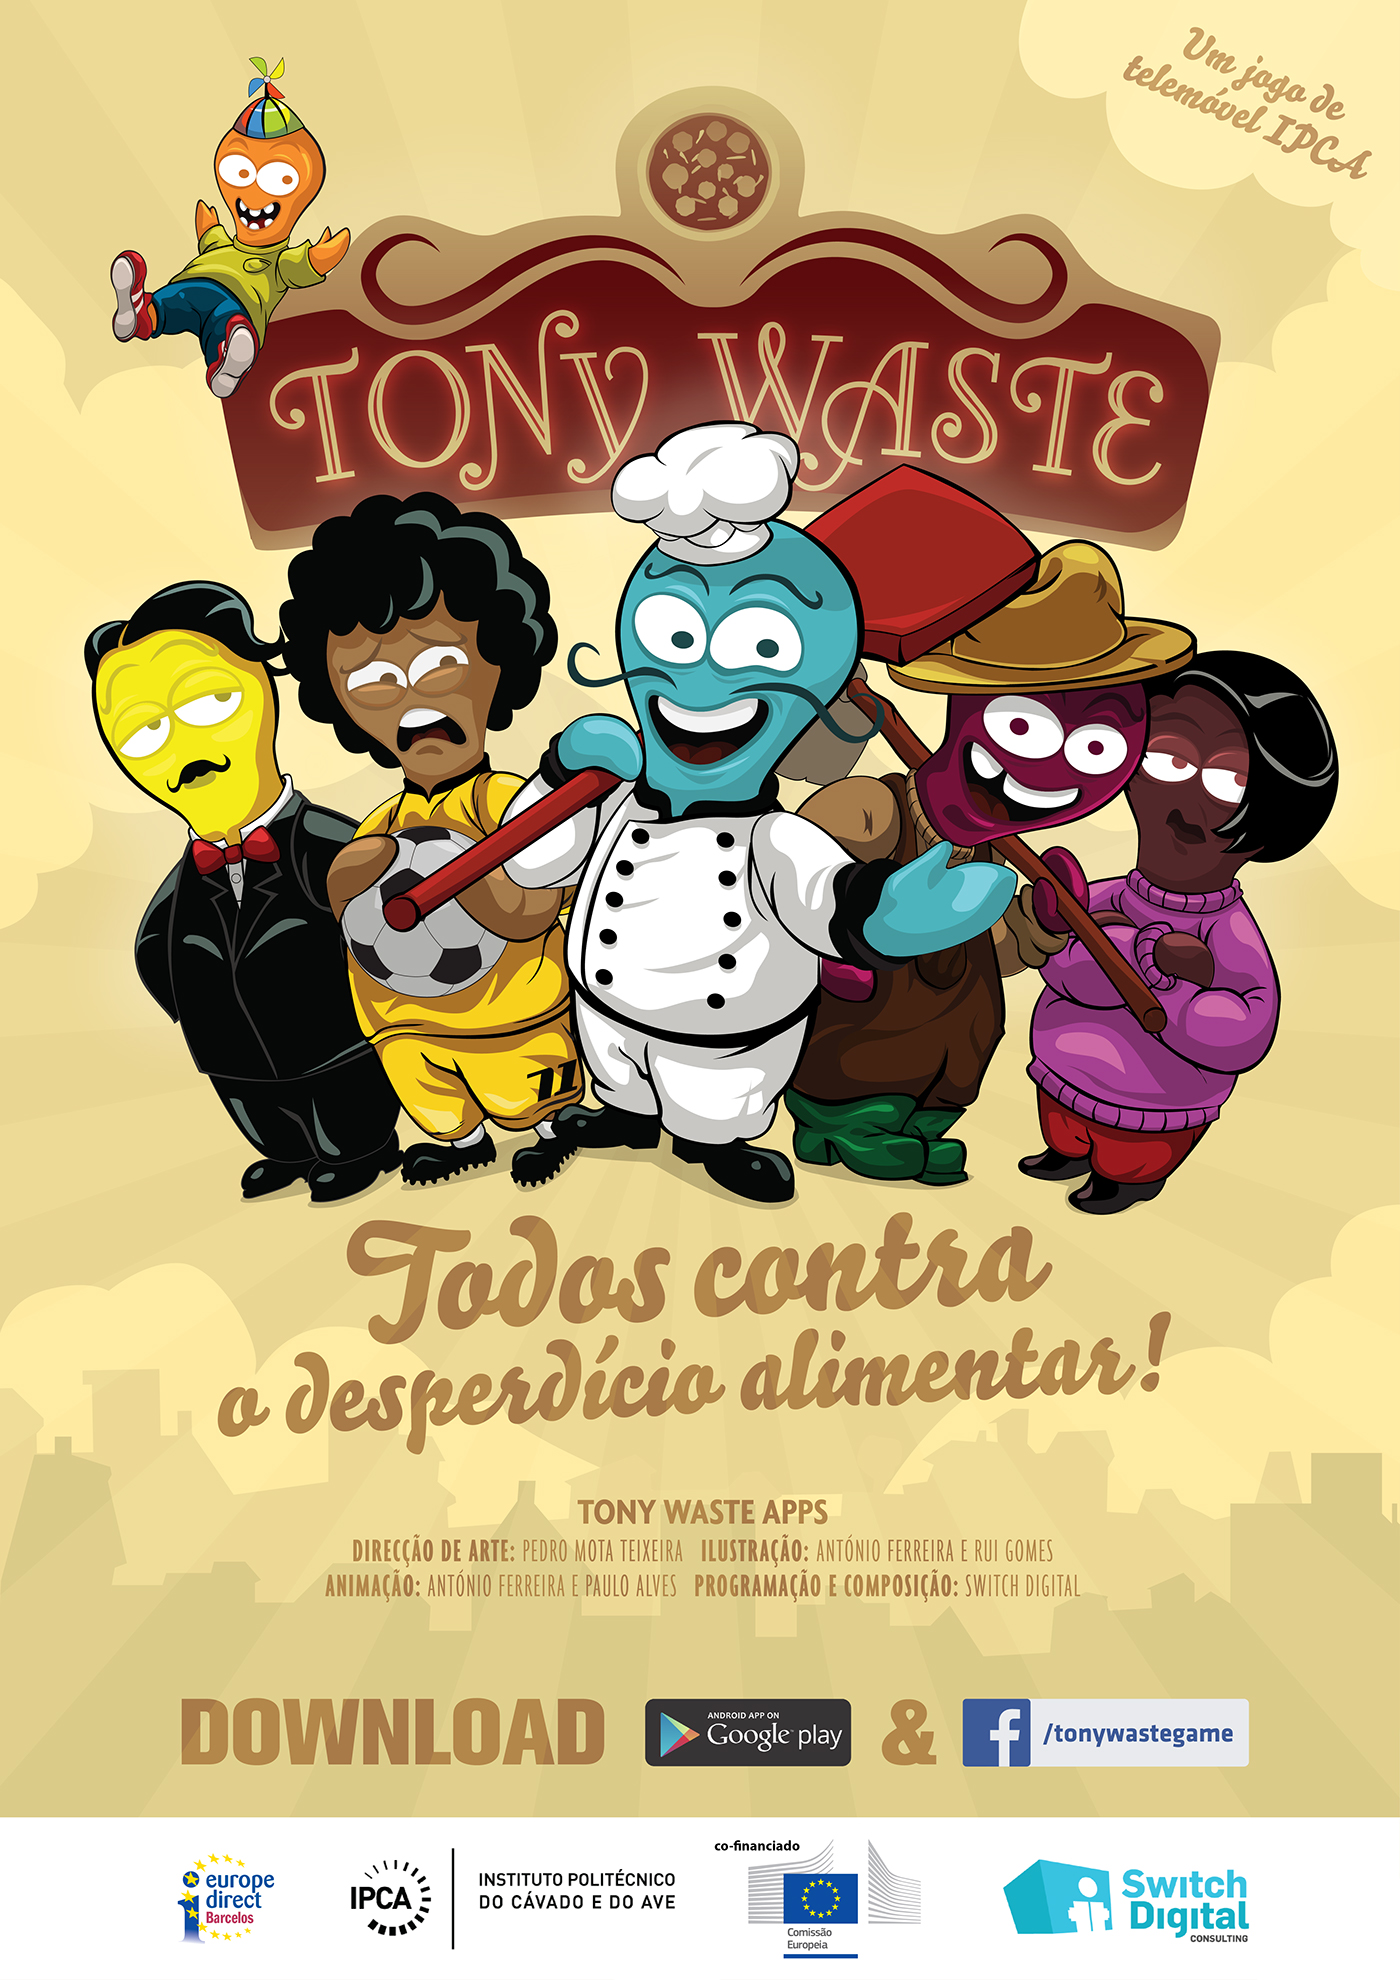 Tony,waste,game,tonywaste,Pizza